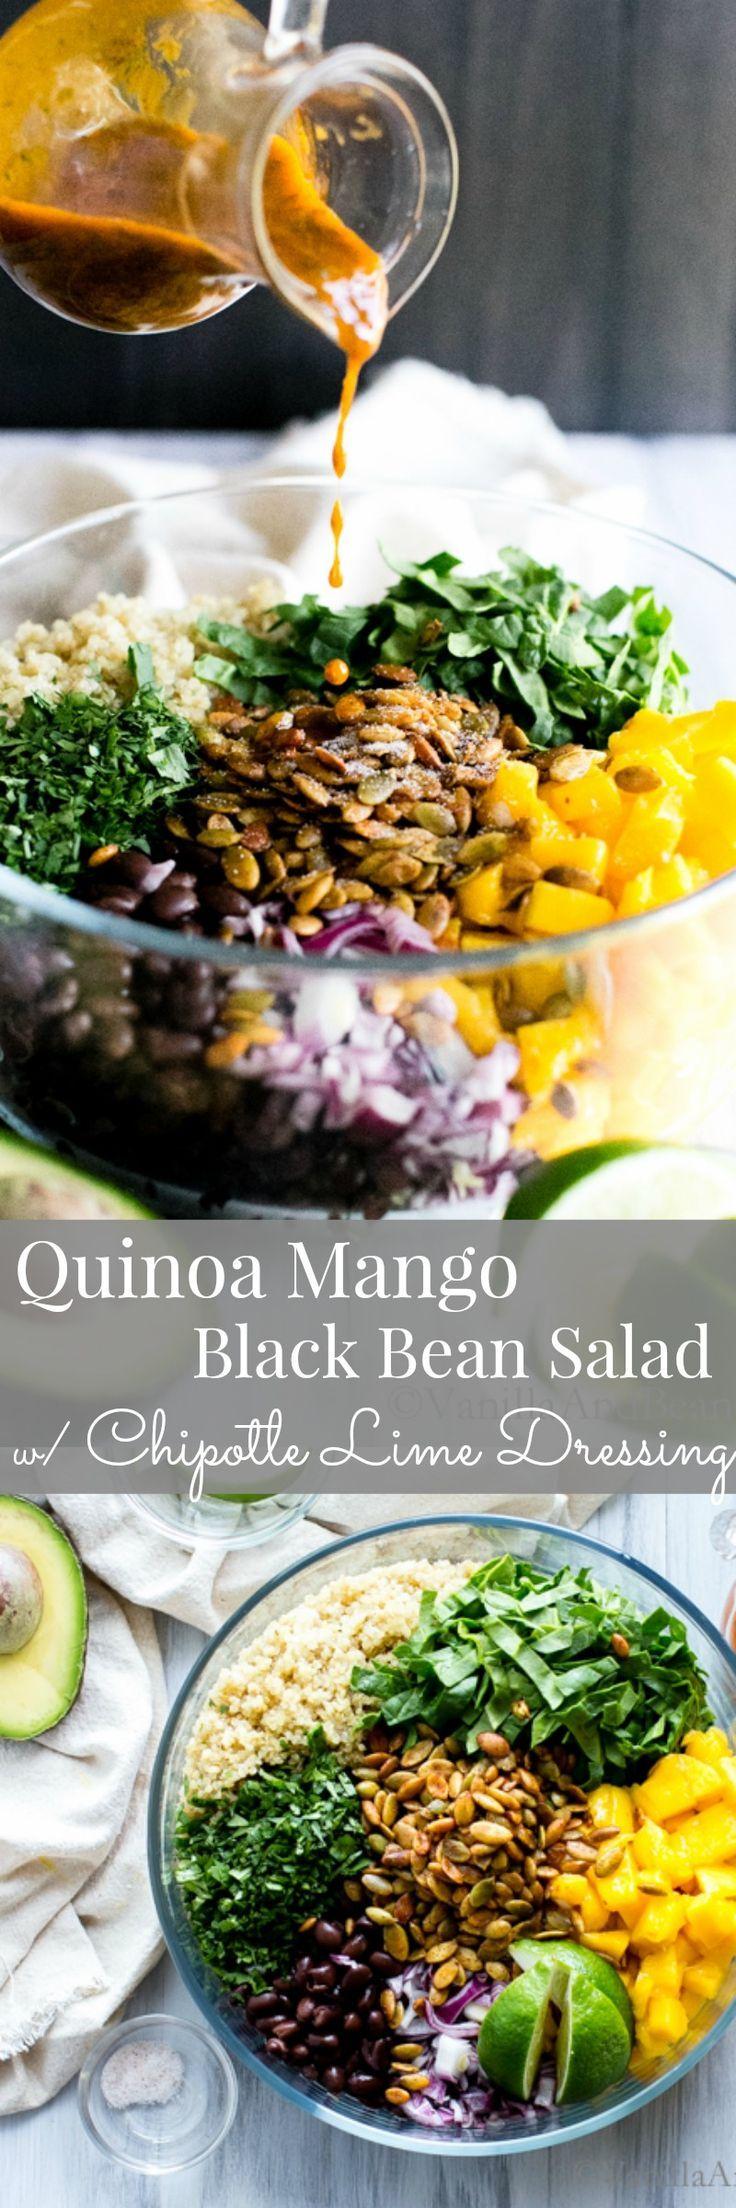 Quinoa Mango Black Bean Salad with an irresistible chipotle dressing! Vegan Recipes | Vegetarian Recipes | Healthy Recipes